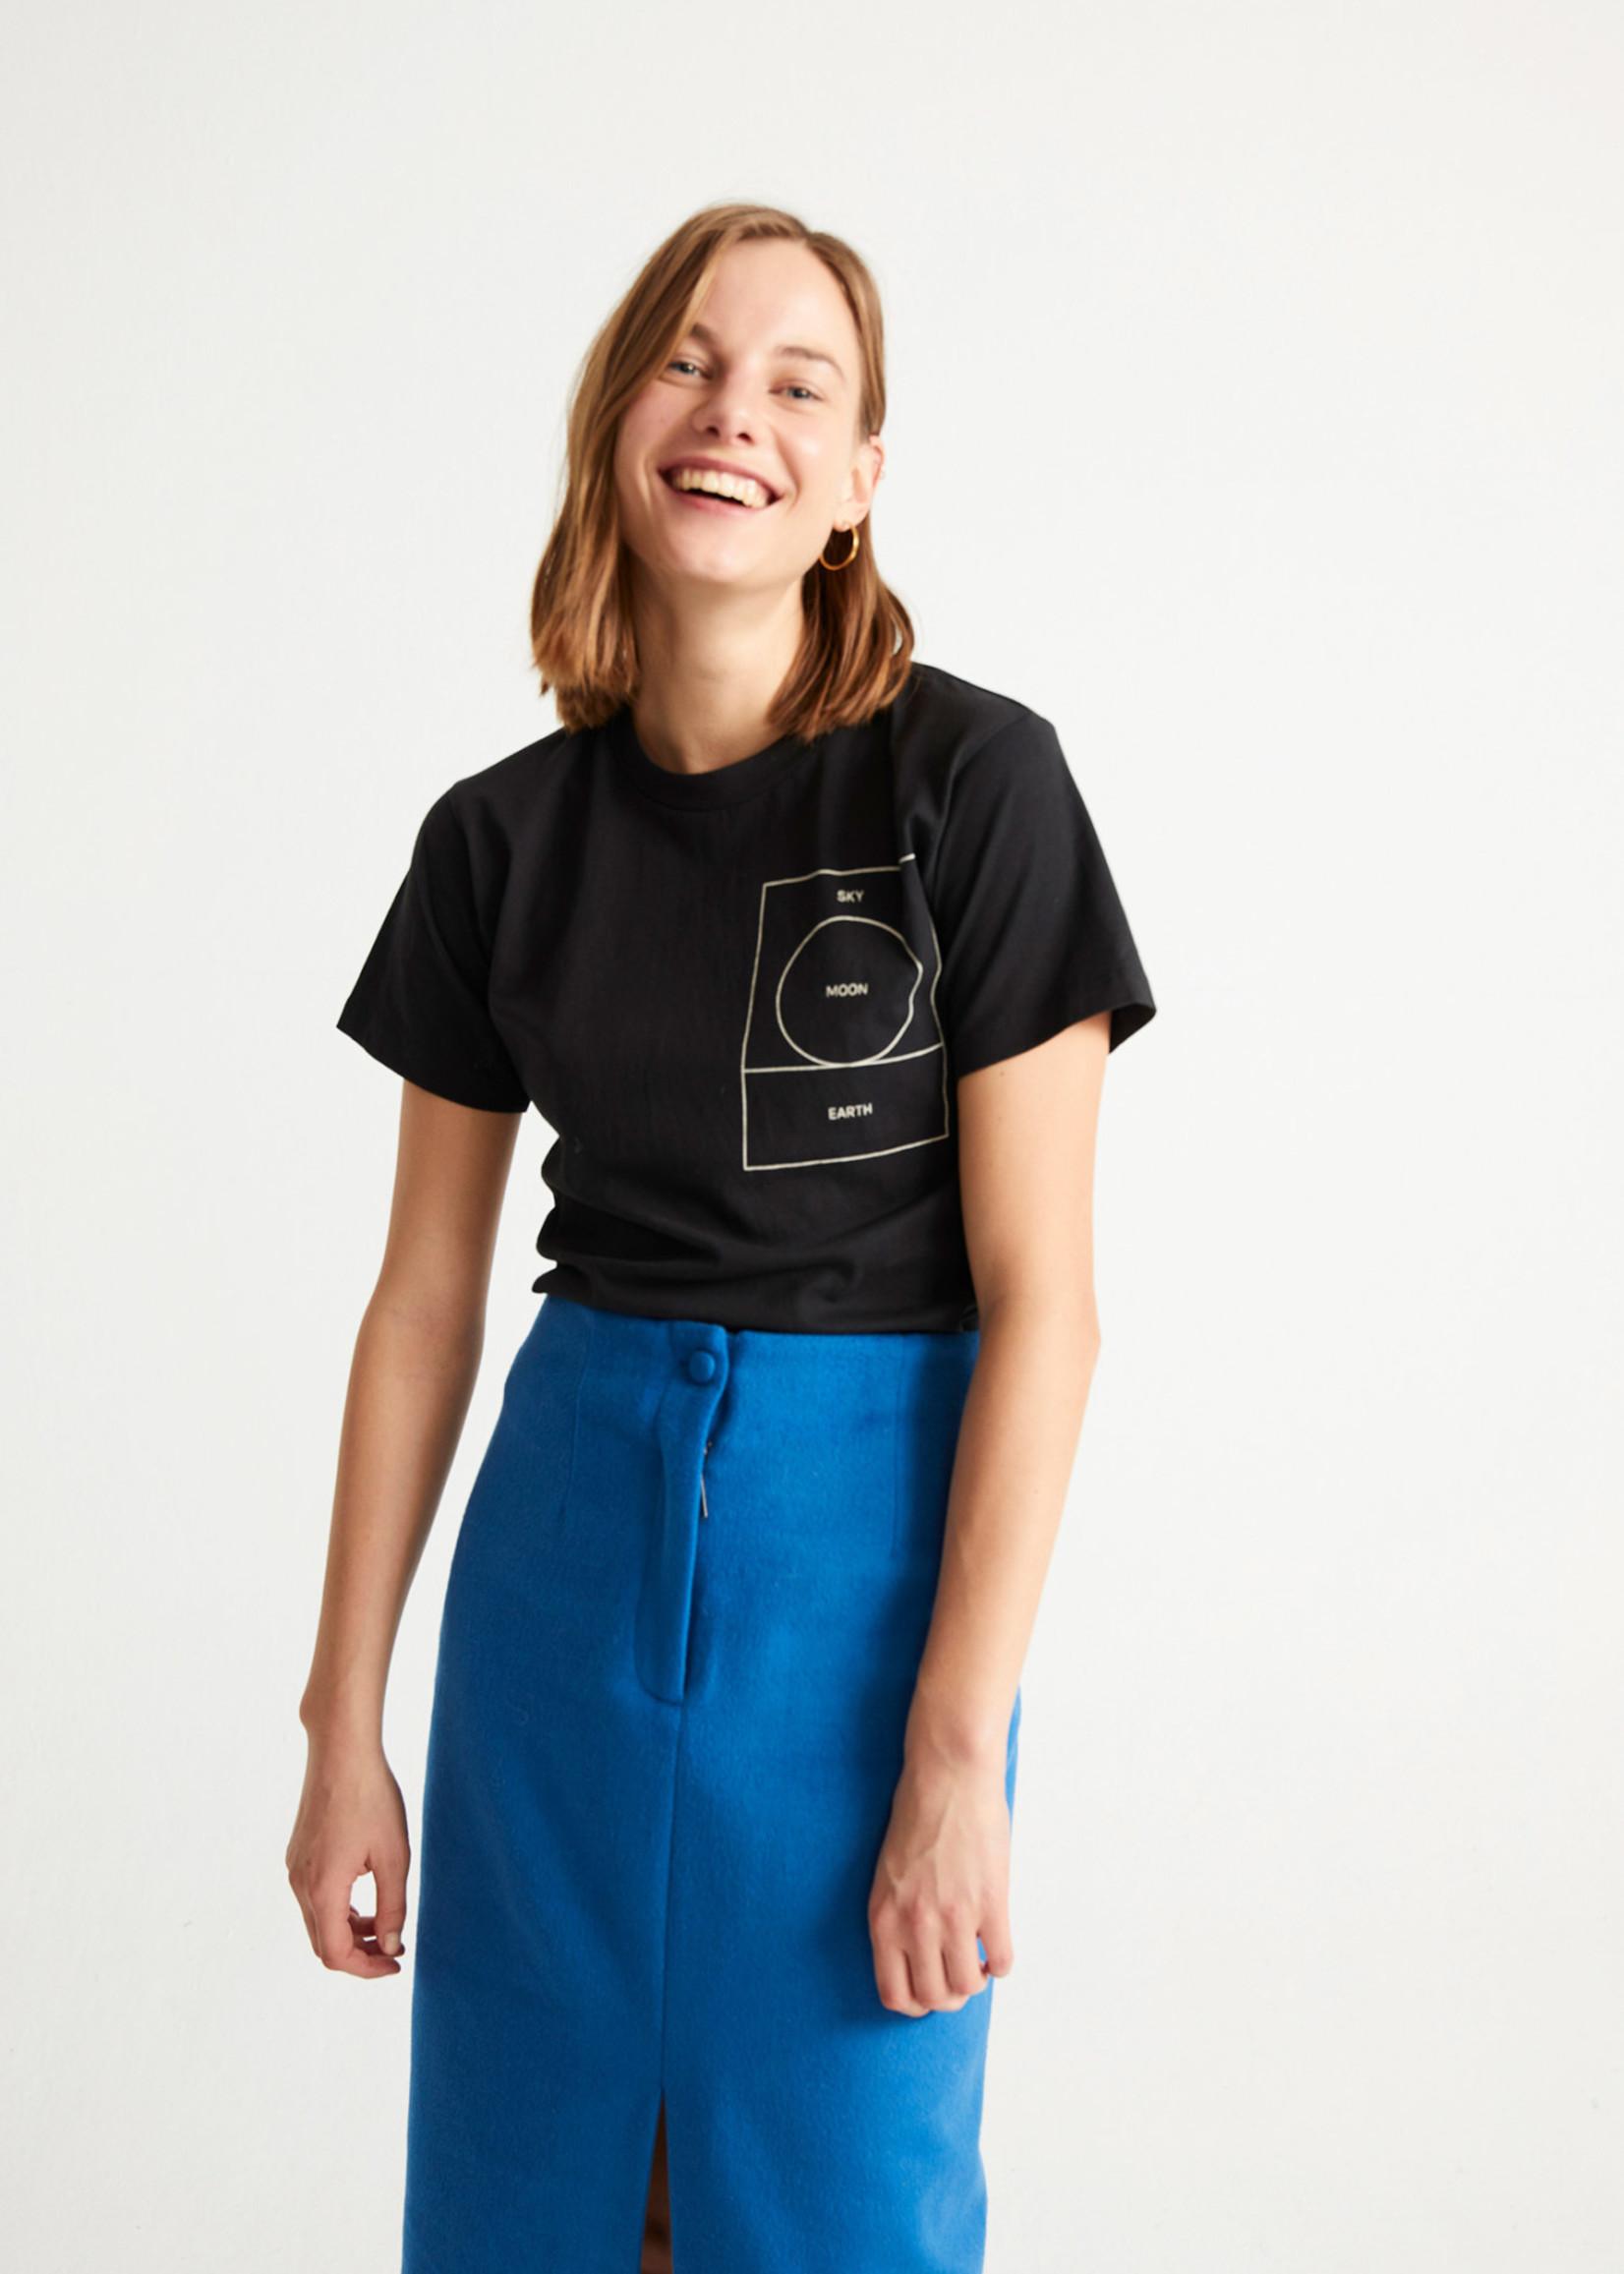 Thinking Mu Ryan Carl Moon T-shirt